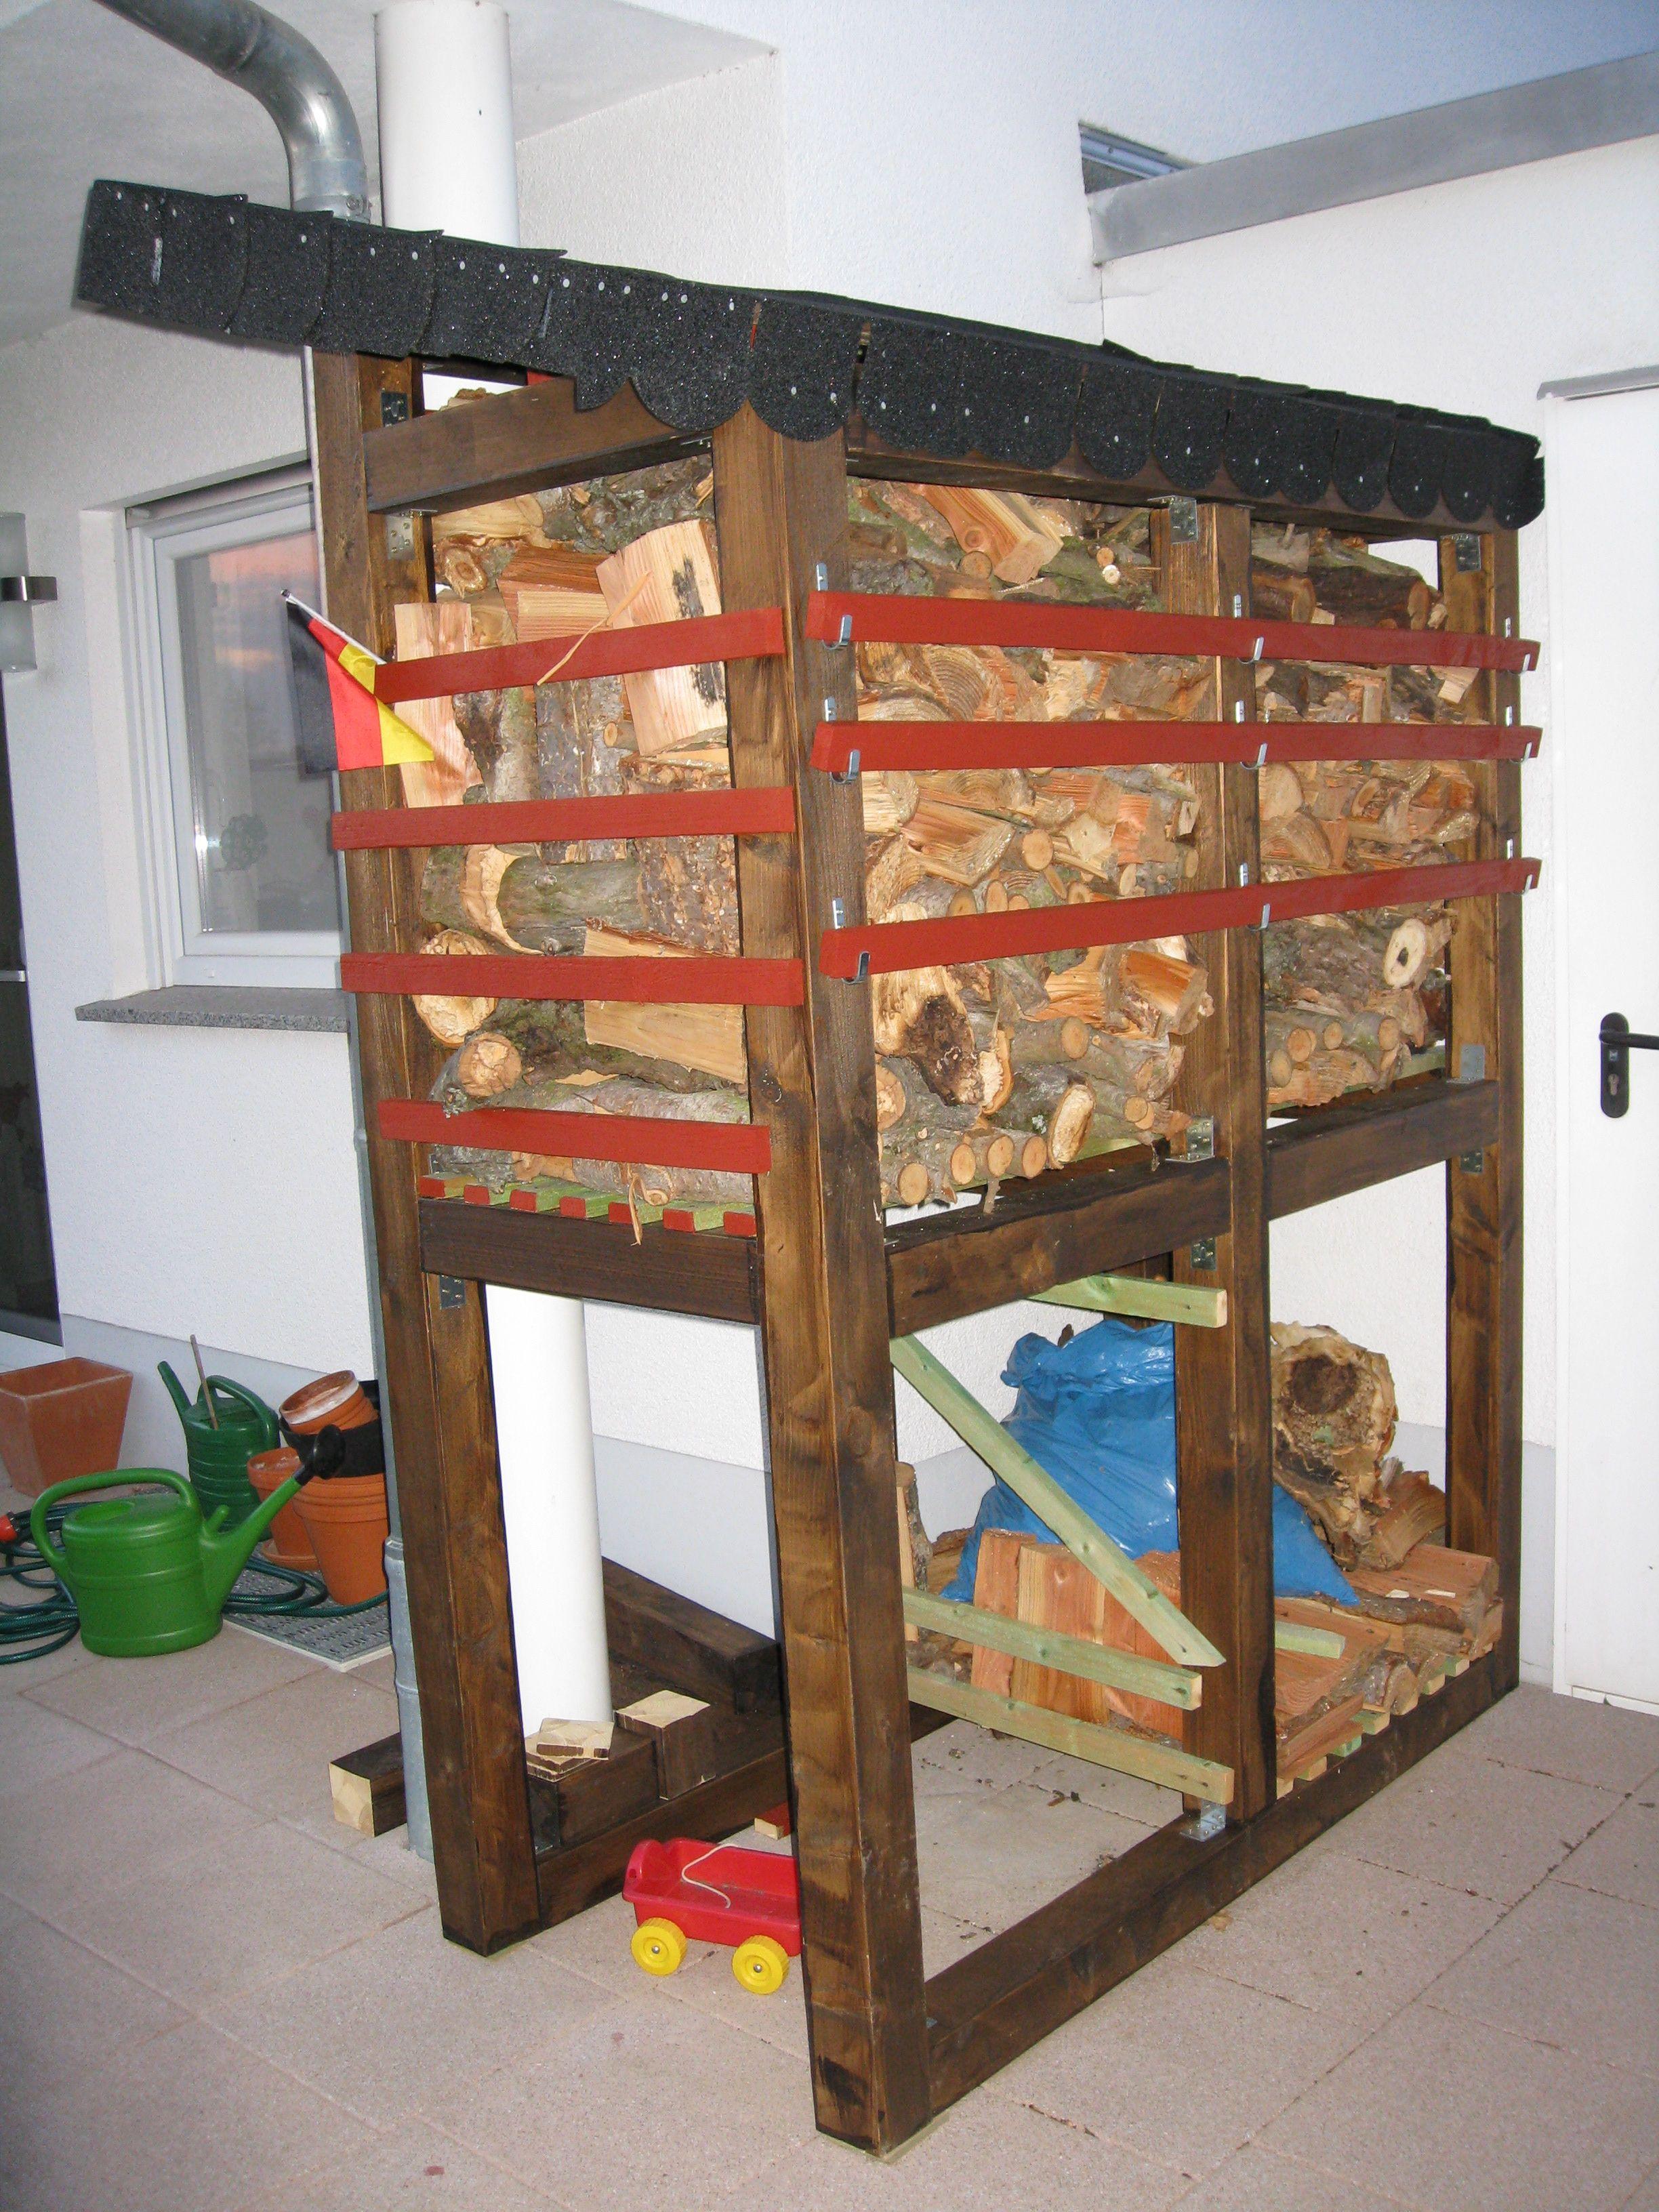 holzstapel f r brennholz bauanleitung zum selber bauen bank brennholz holz und bau. Black Bedroom Furniture Sets. Home Design Ideas